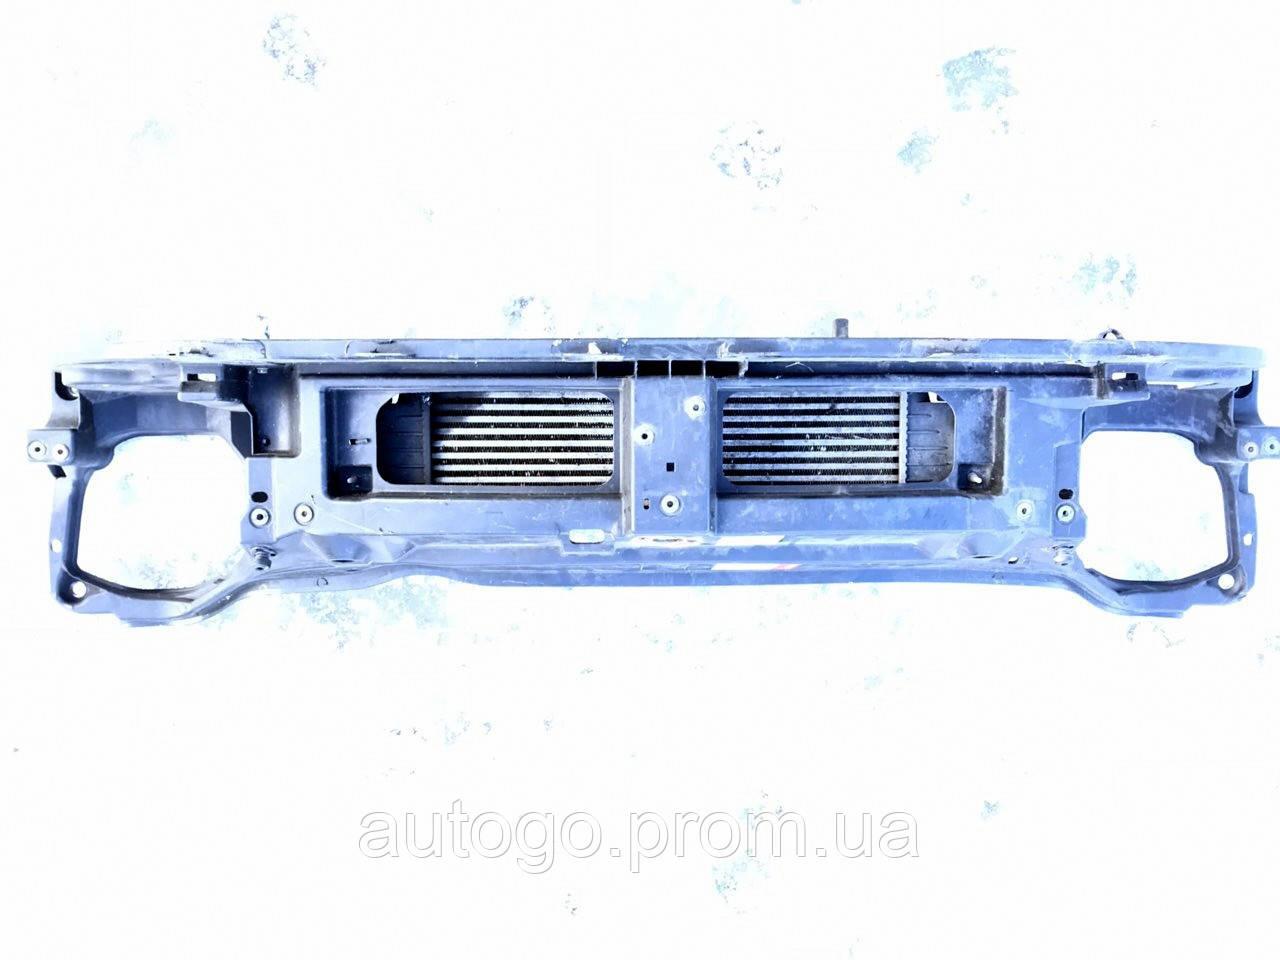 Панель передняя / Телевизор Opel Vivaro Nissan Primastar Renault Trafic